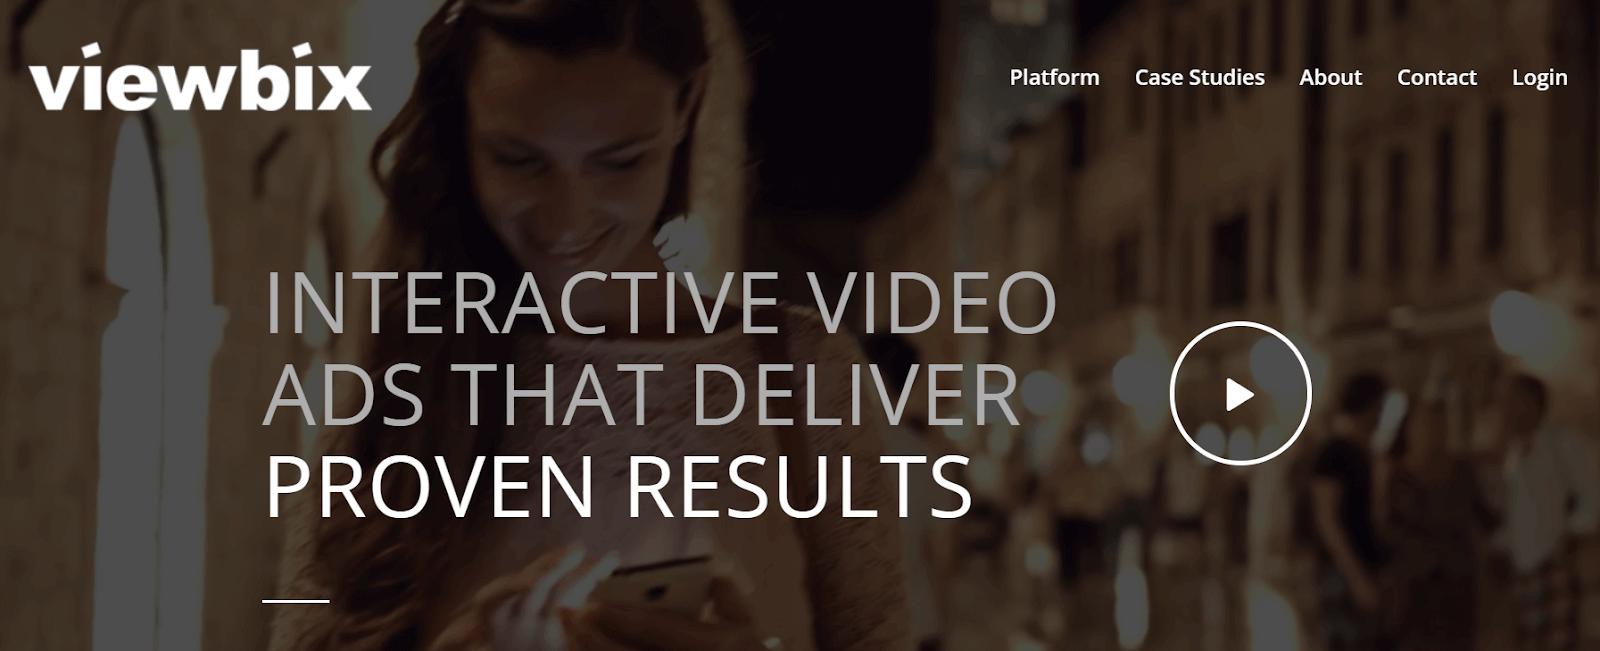 Viewbix Video Marketing Tool